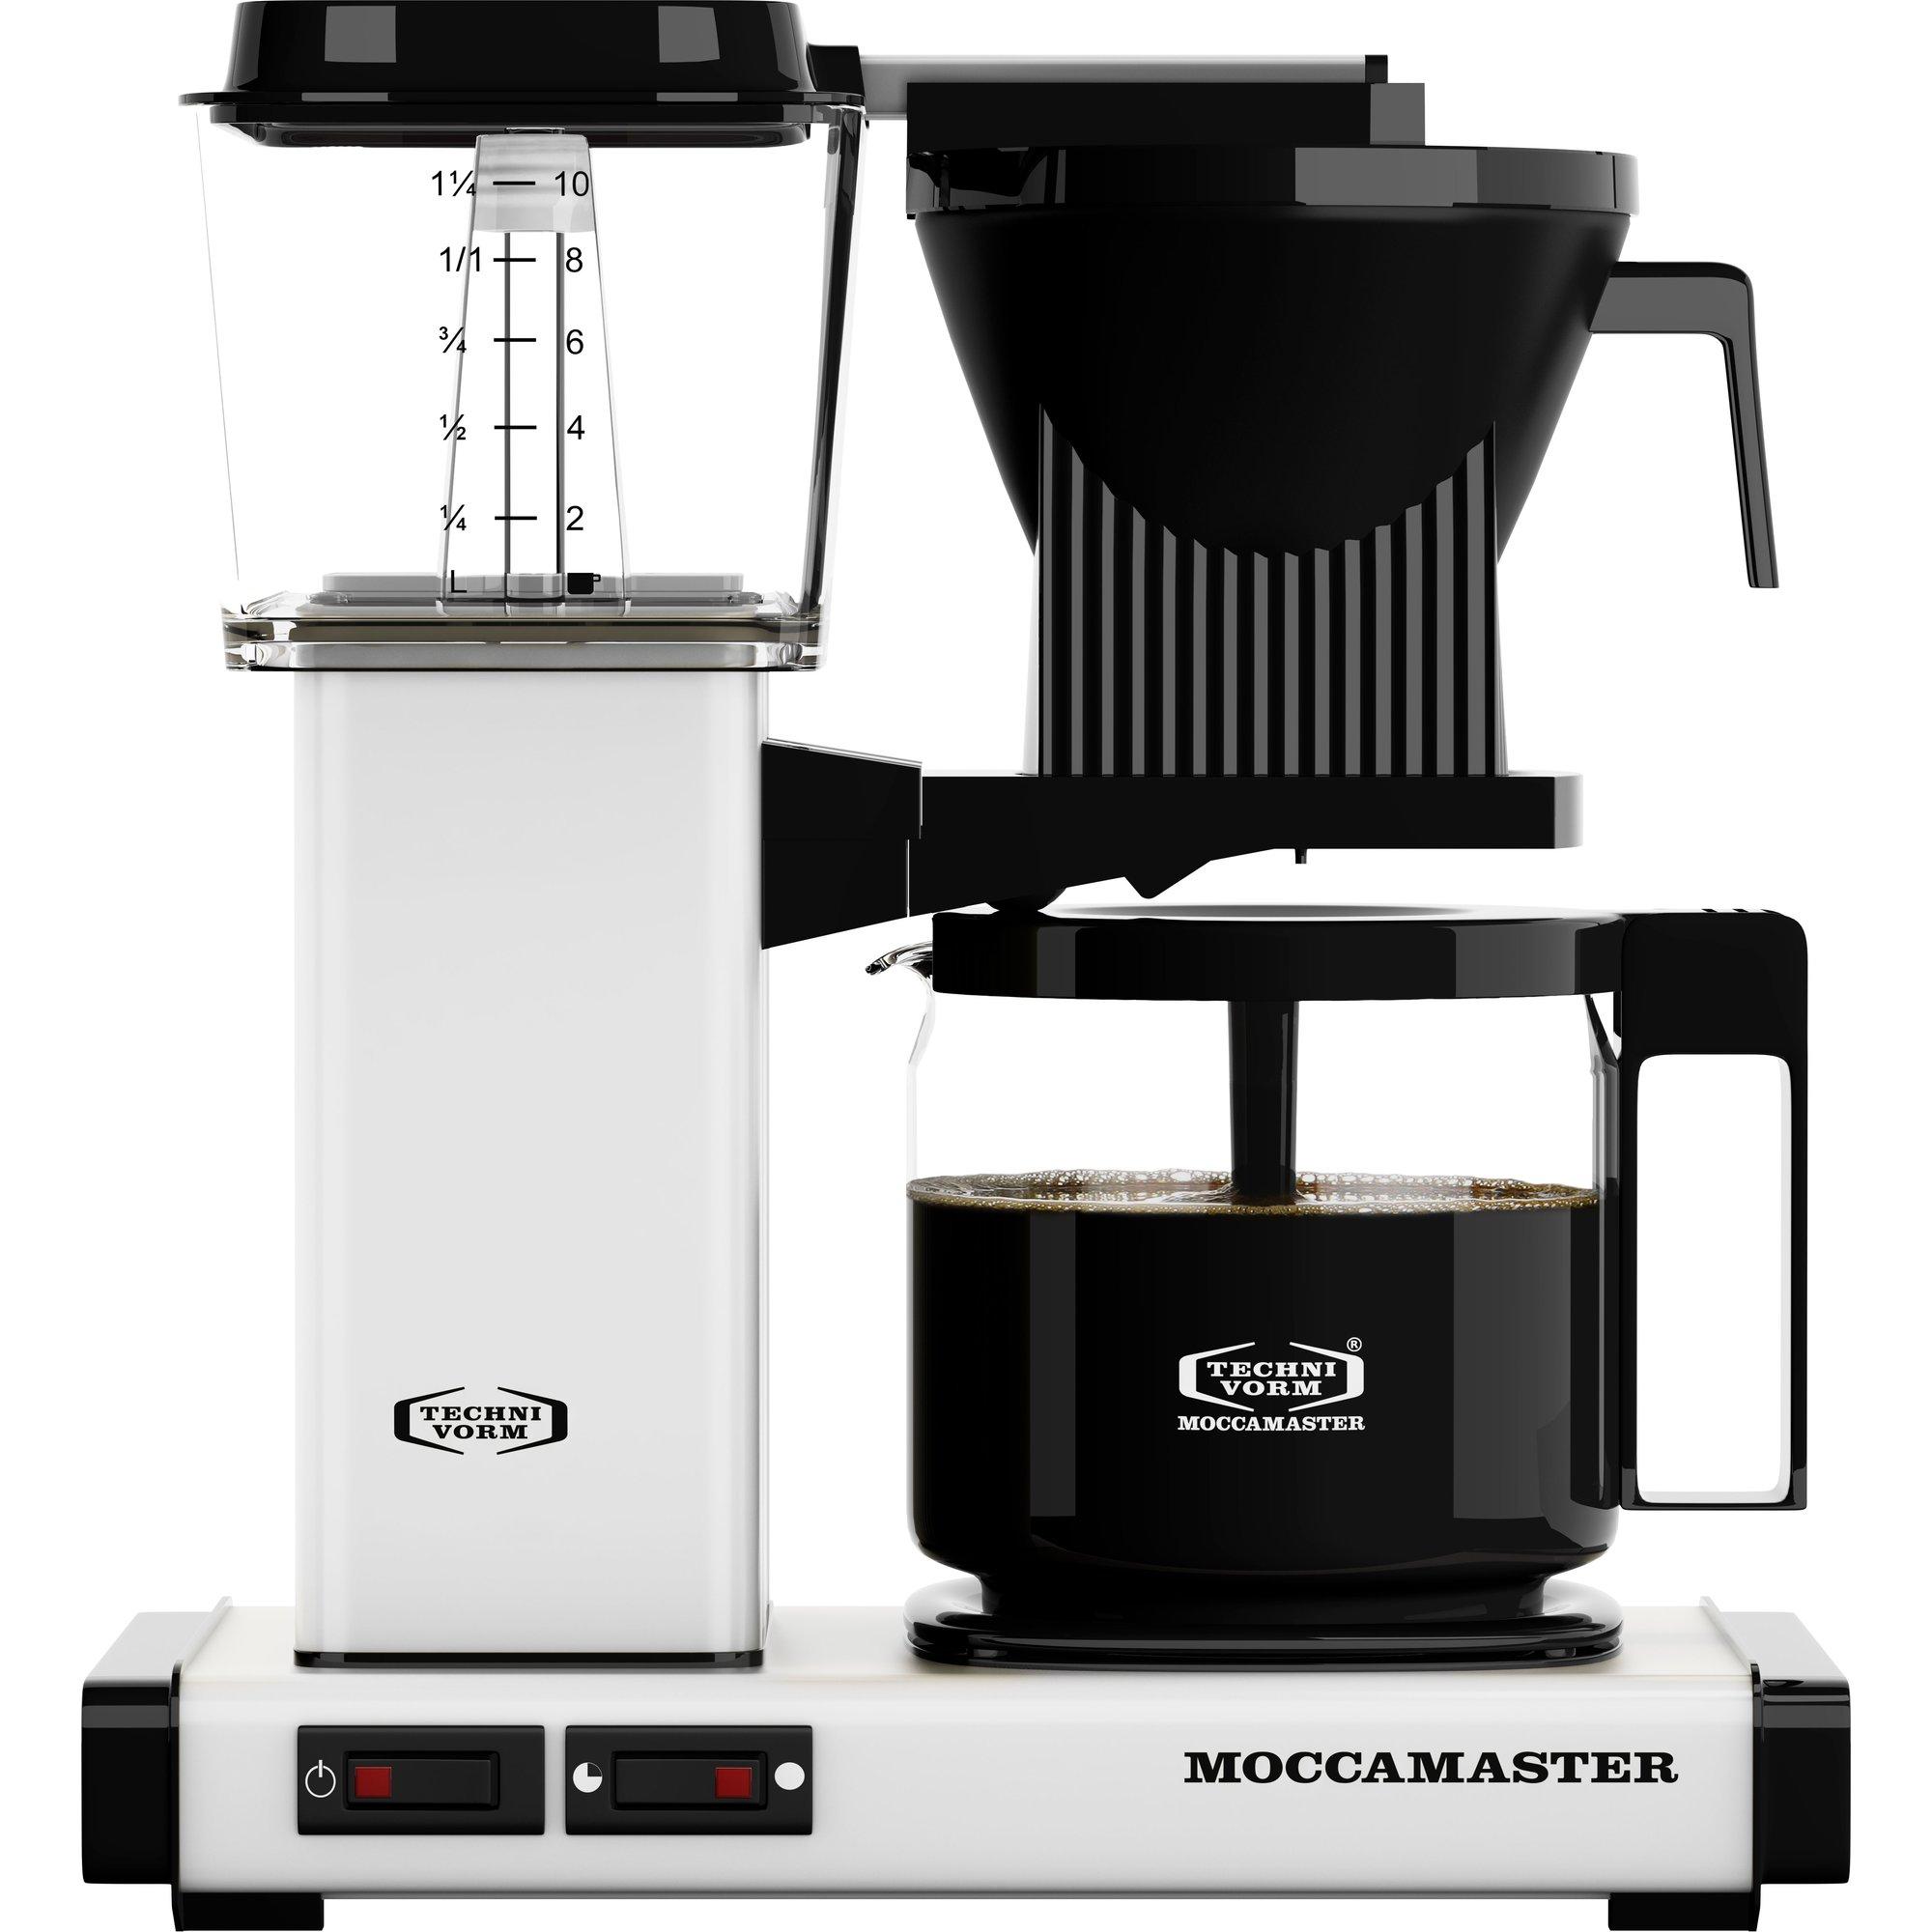 Moccamaster Kaffebryggare KBG962AO Polished White